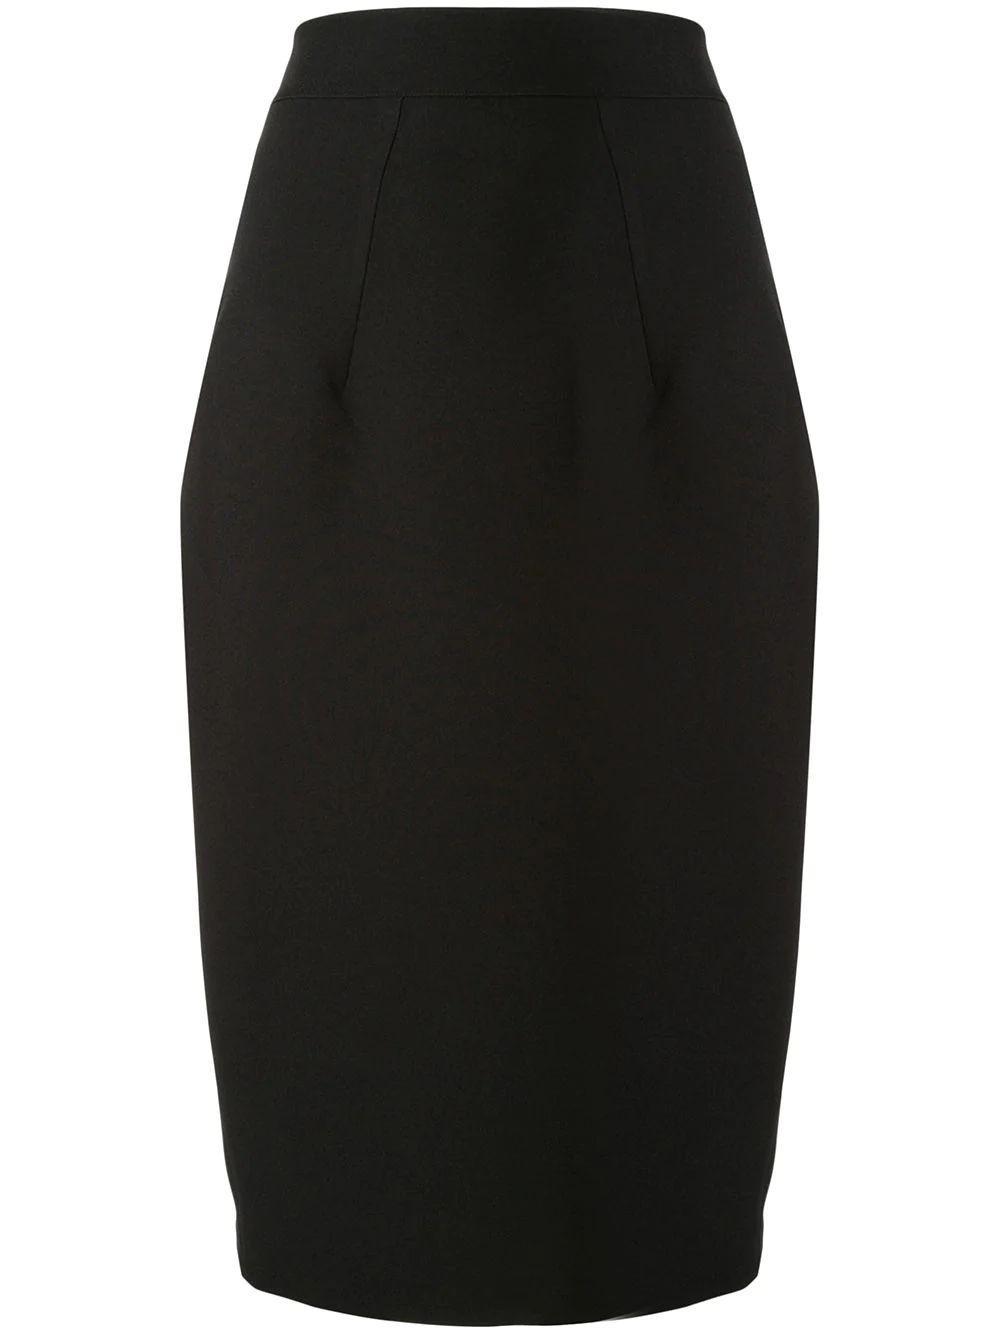 Hokoku Pencil Skirt